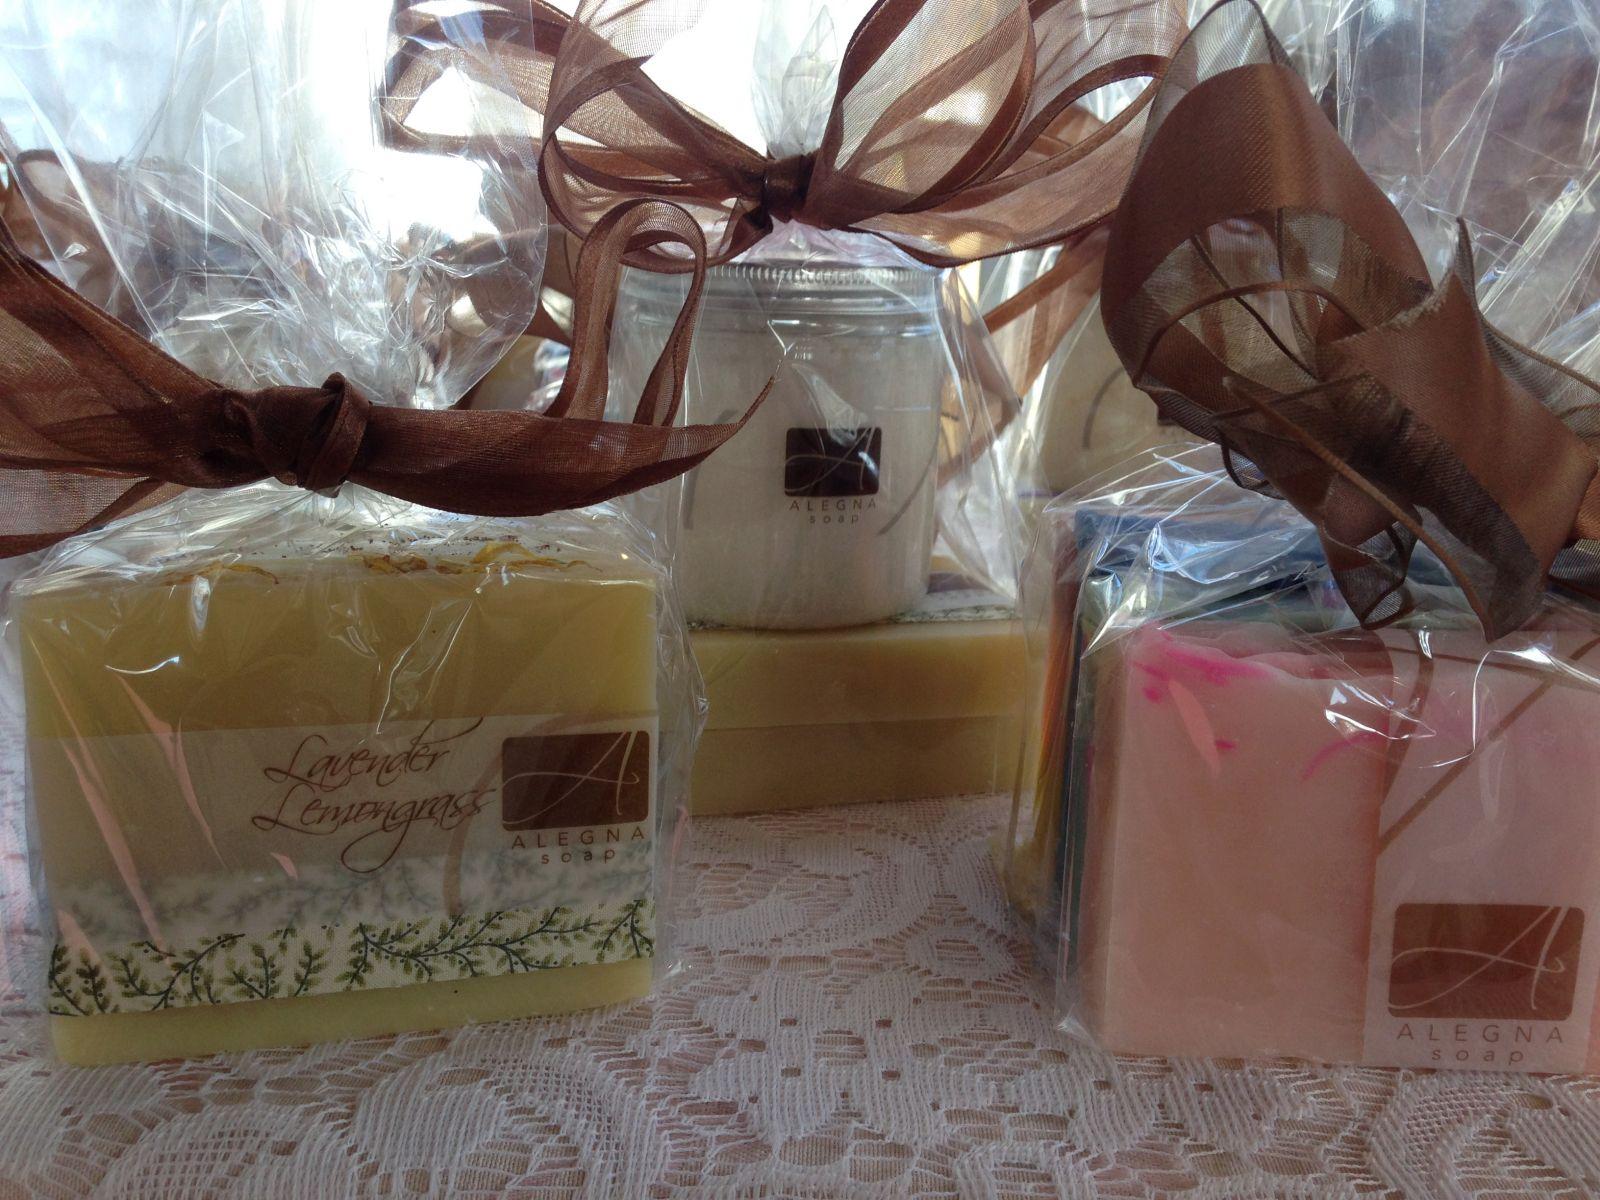 Alegna Soap® gifts